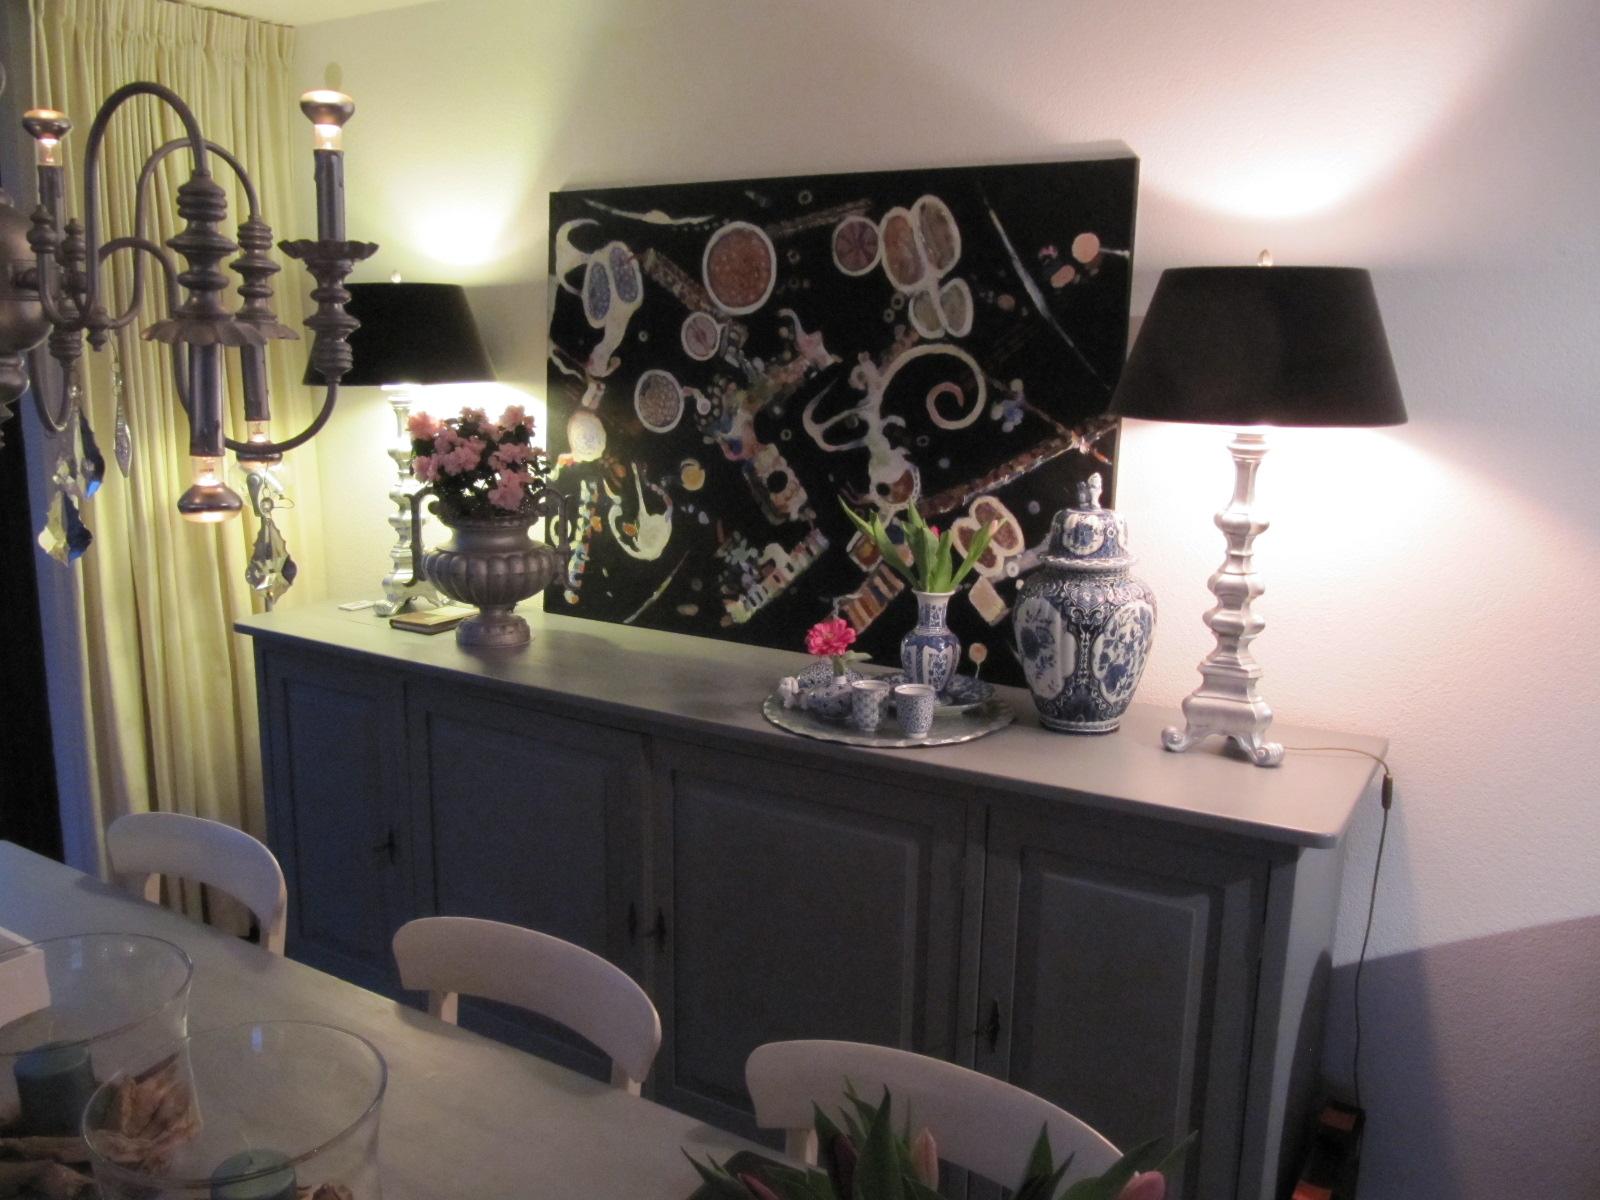 Is interieur styling j hagenbeuk - Schilderij in de kamer ...